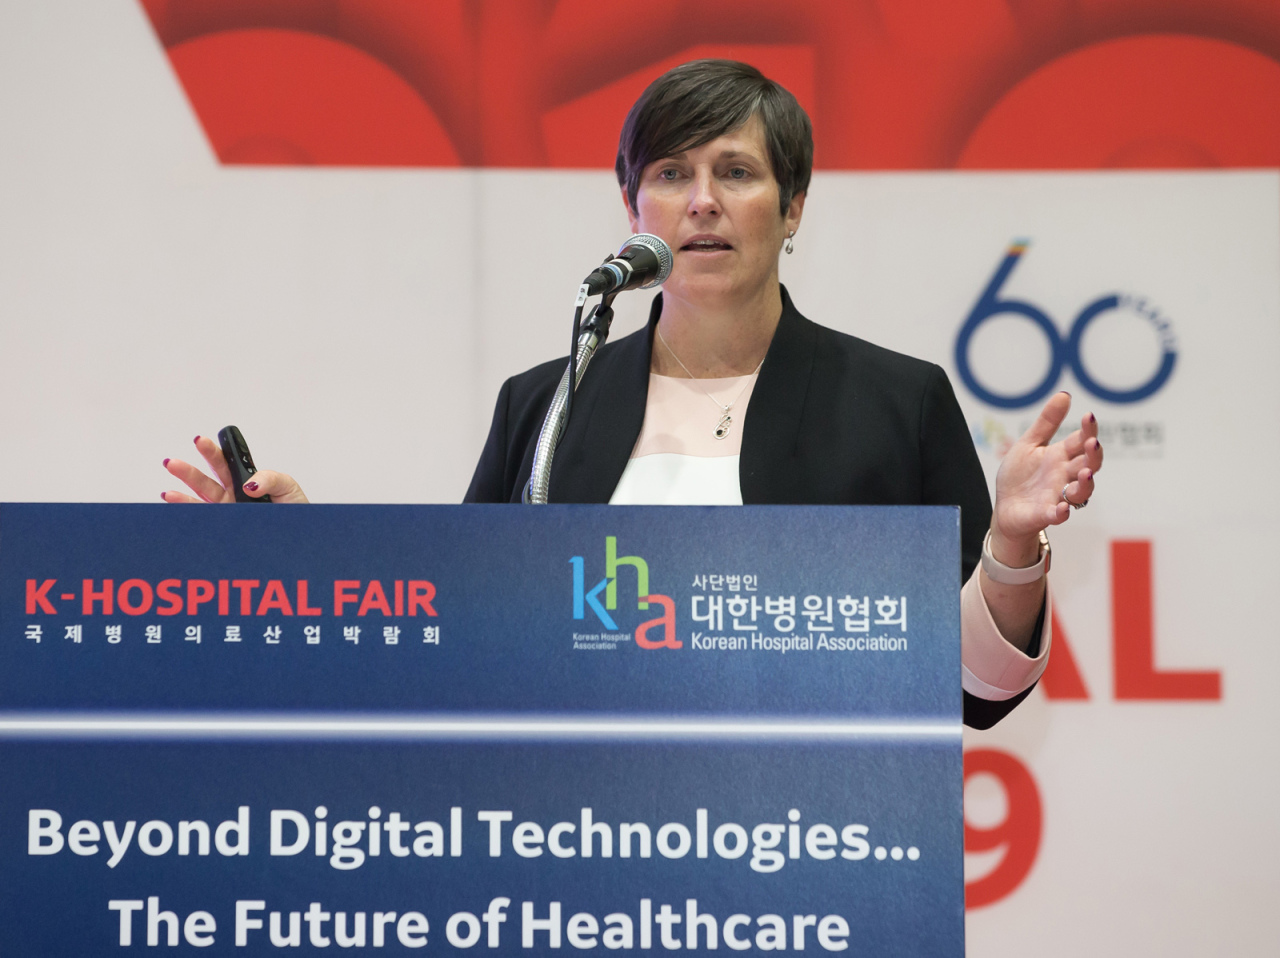 Kerrie Hauge, managing director of GE Healthcare. (GE Healthcare)